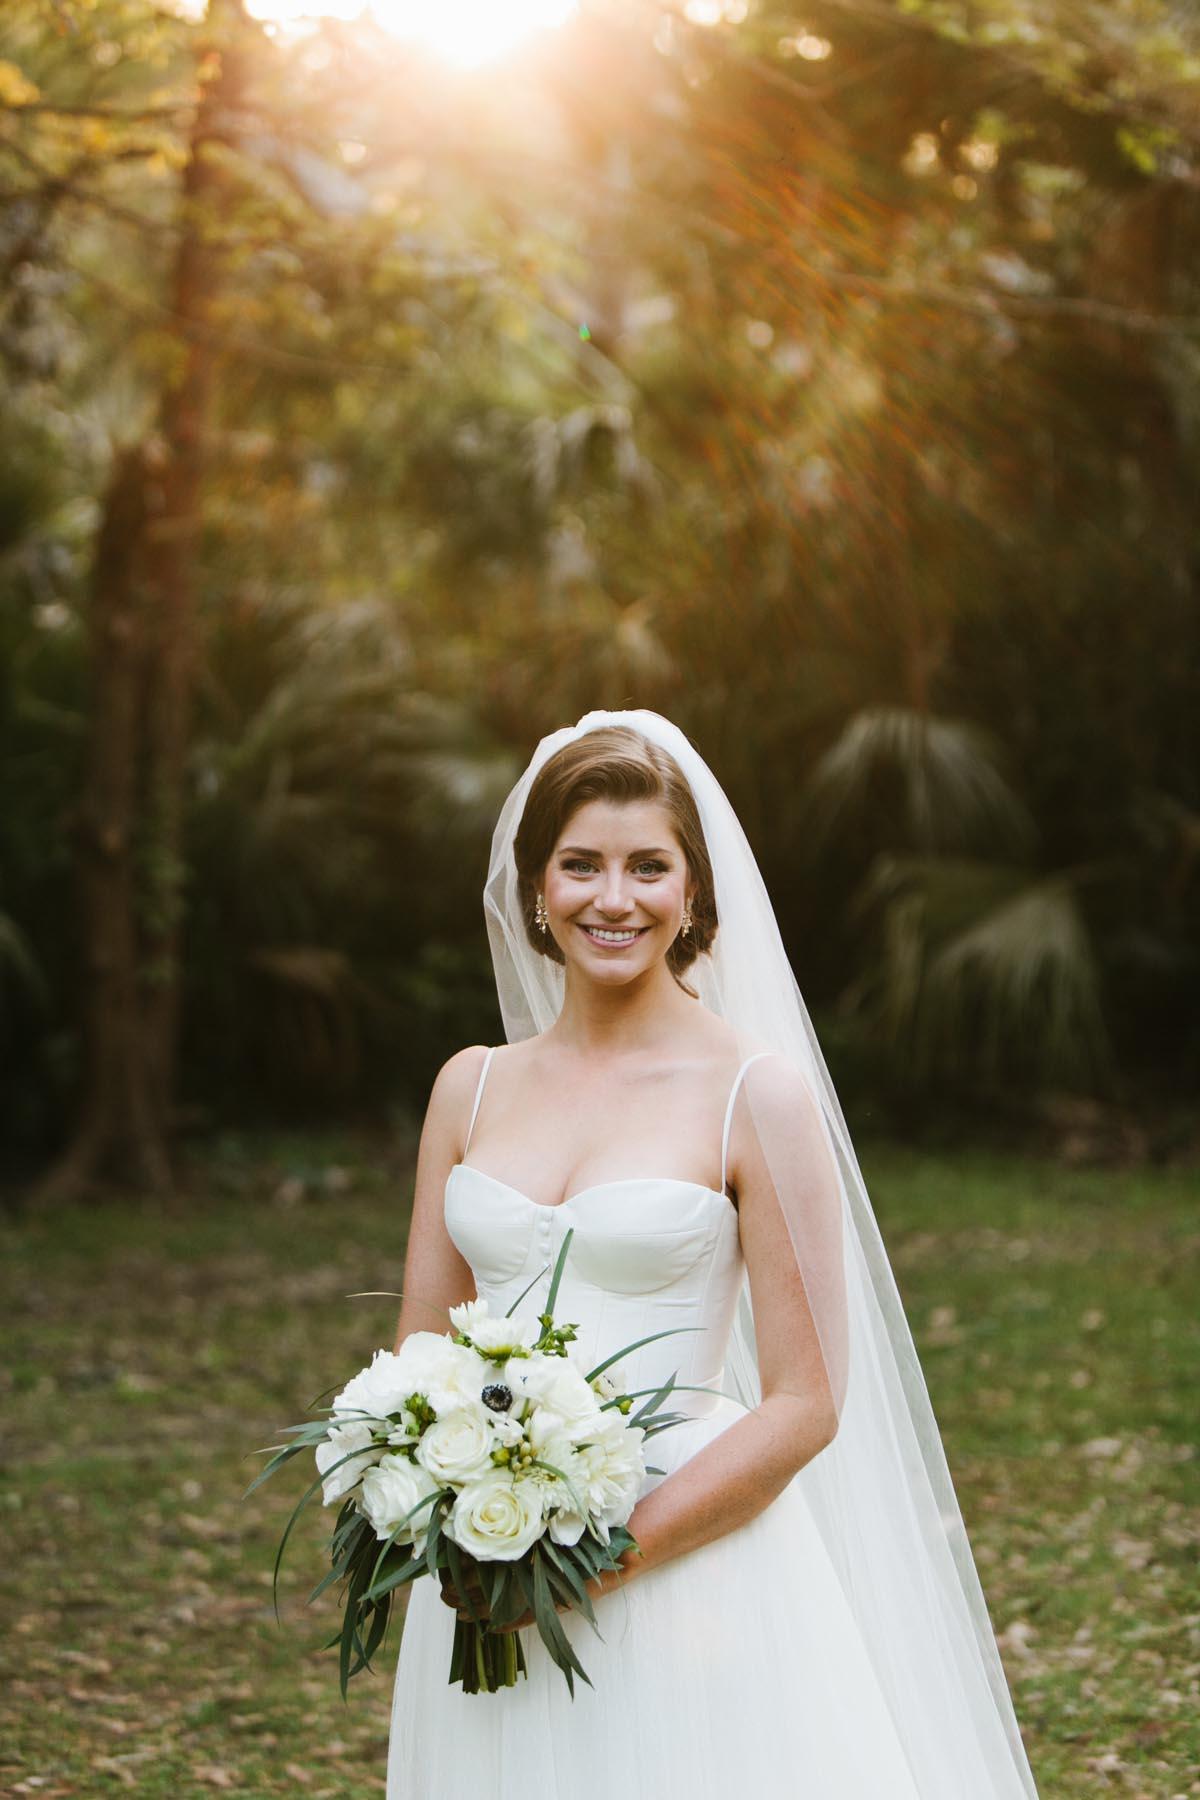 lowry wedding blog eden garden florida wedding-89